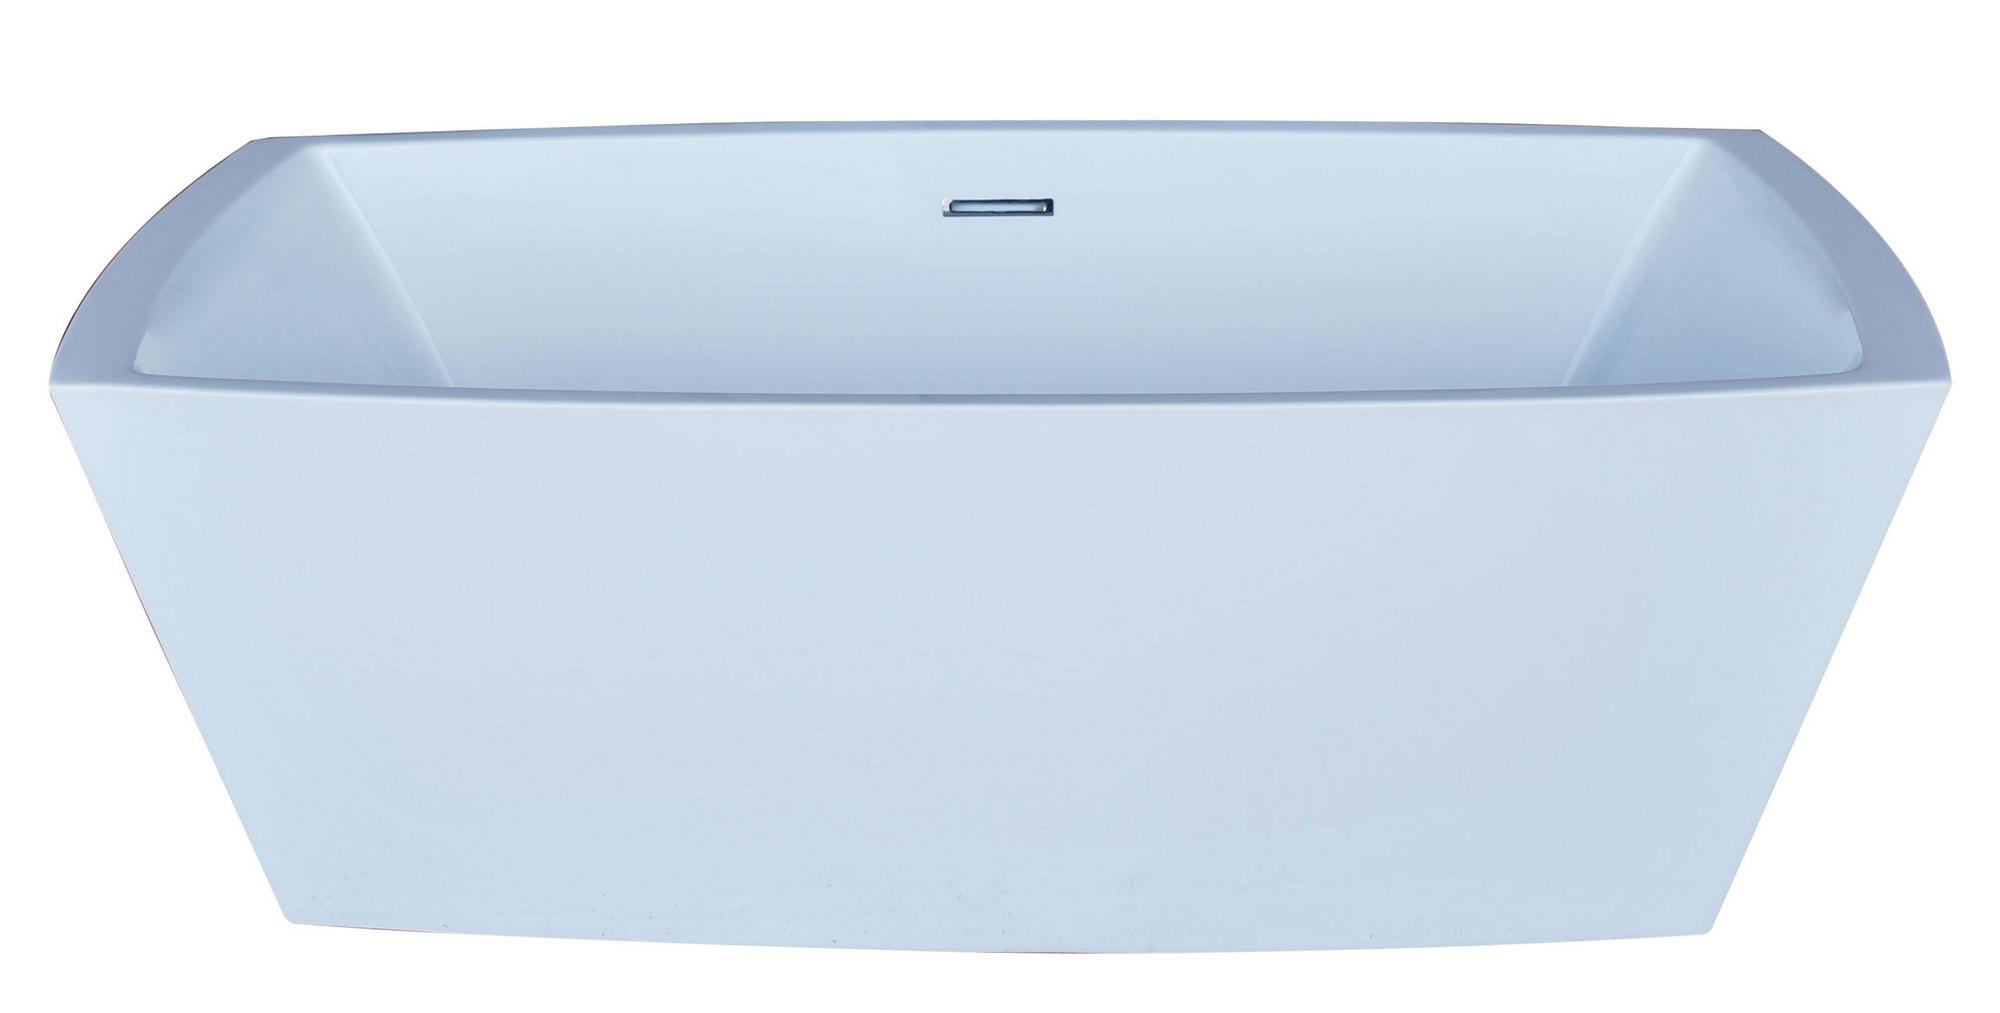 MediTub 6731ATSXCWXX Atlantis Whirlpools Antione Rectangle Acrylic Bathtub